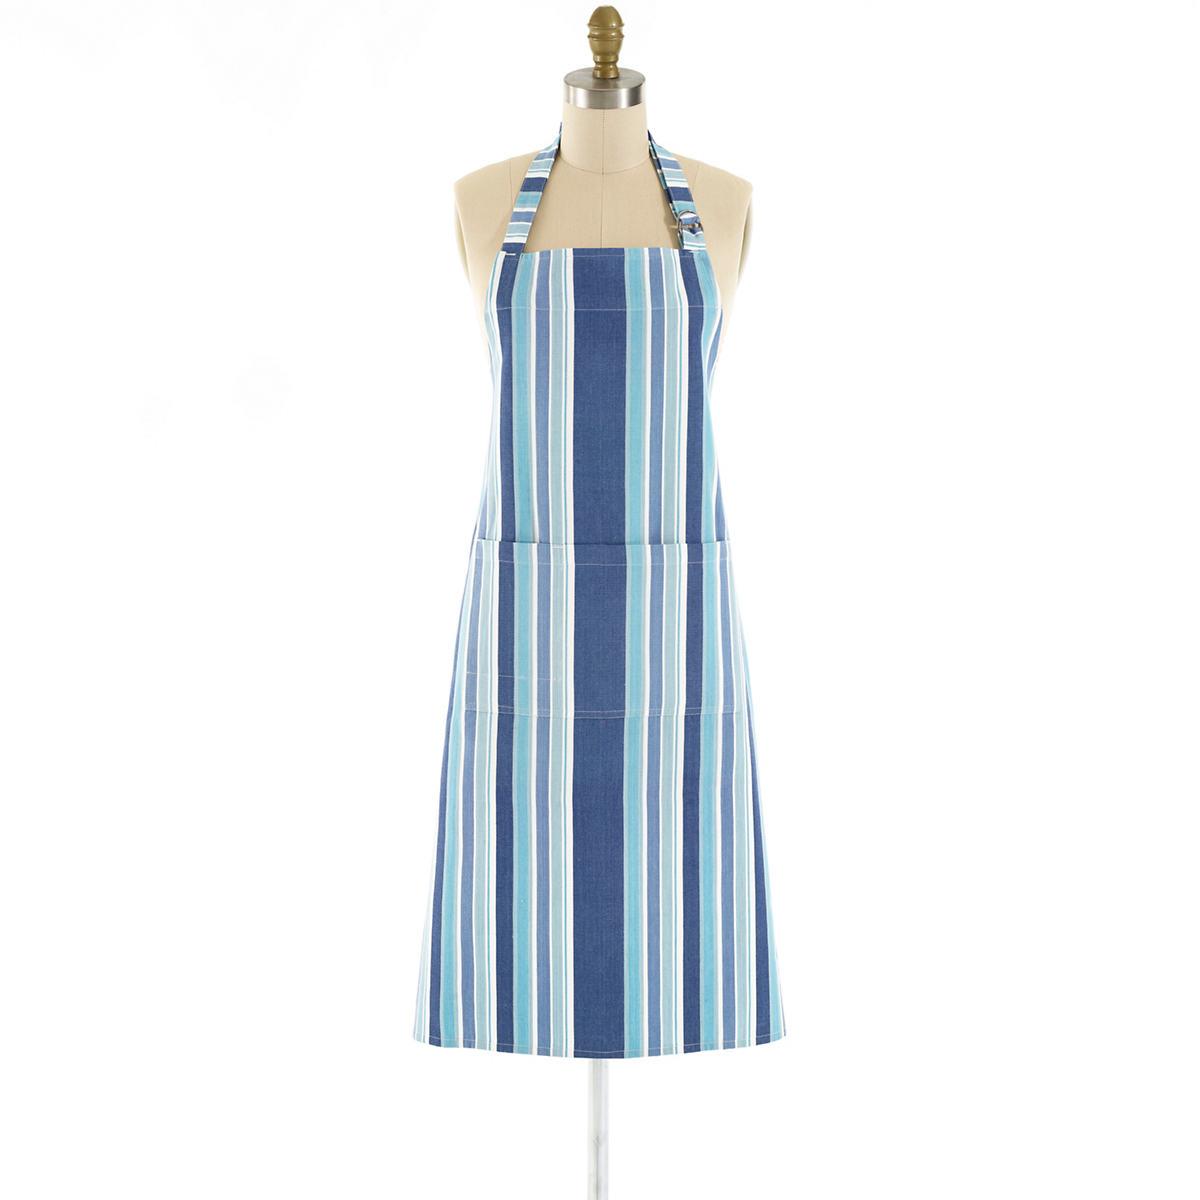 Bluemarine Stripe Apron